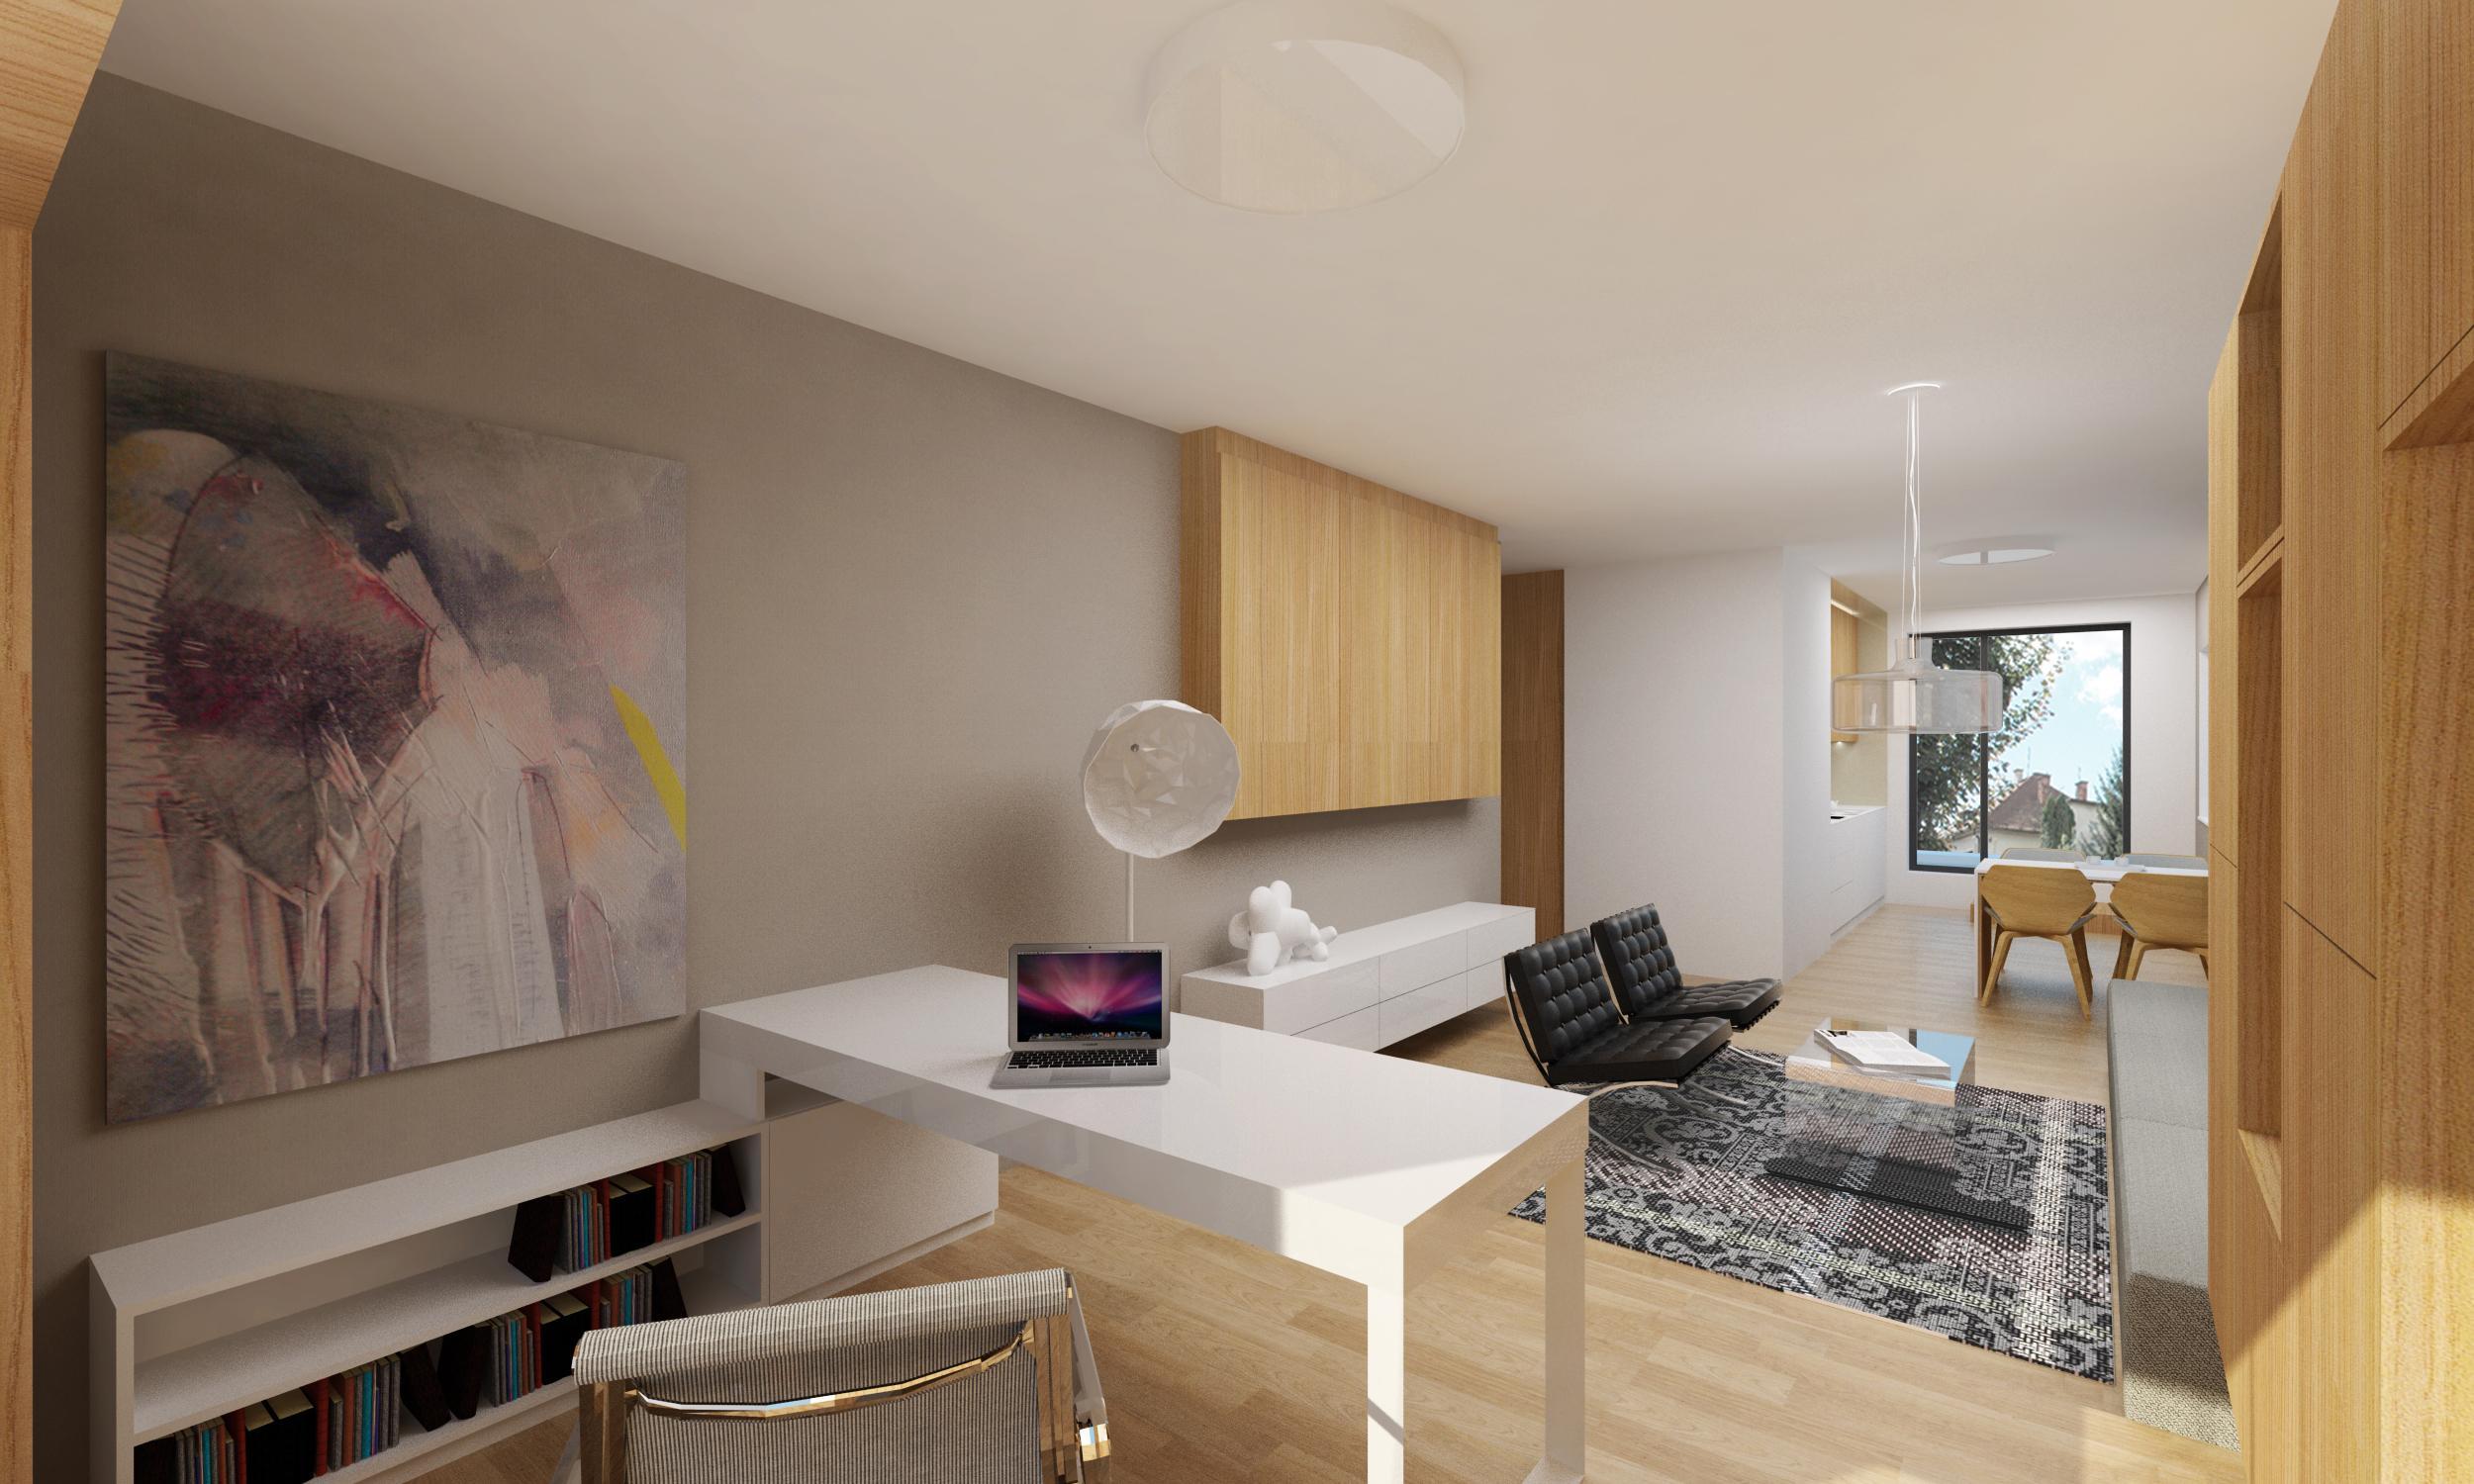 idea for an attic room - Apartment Entrance Design Swedish apartment boasts